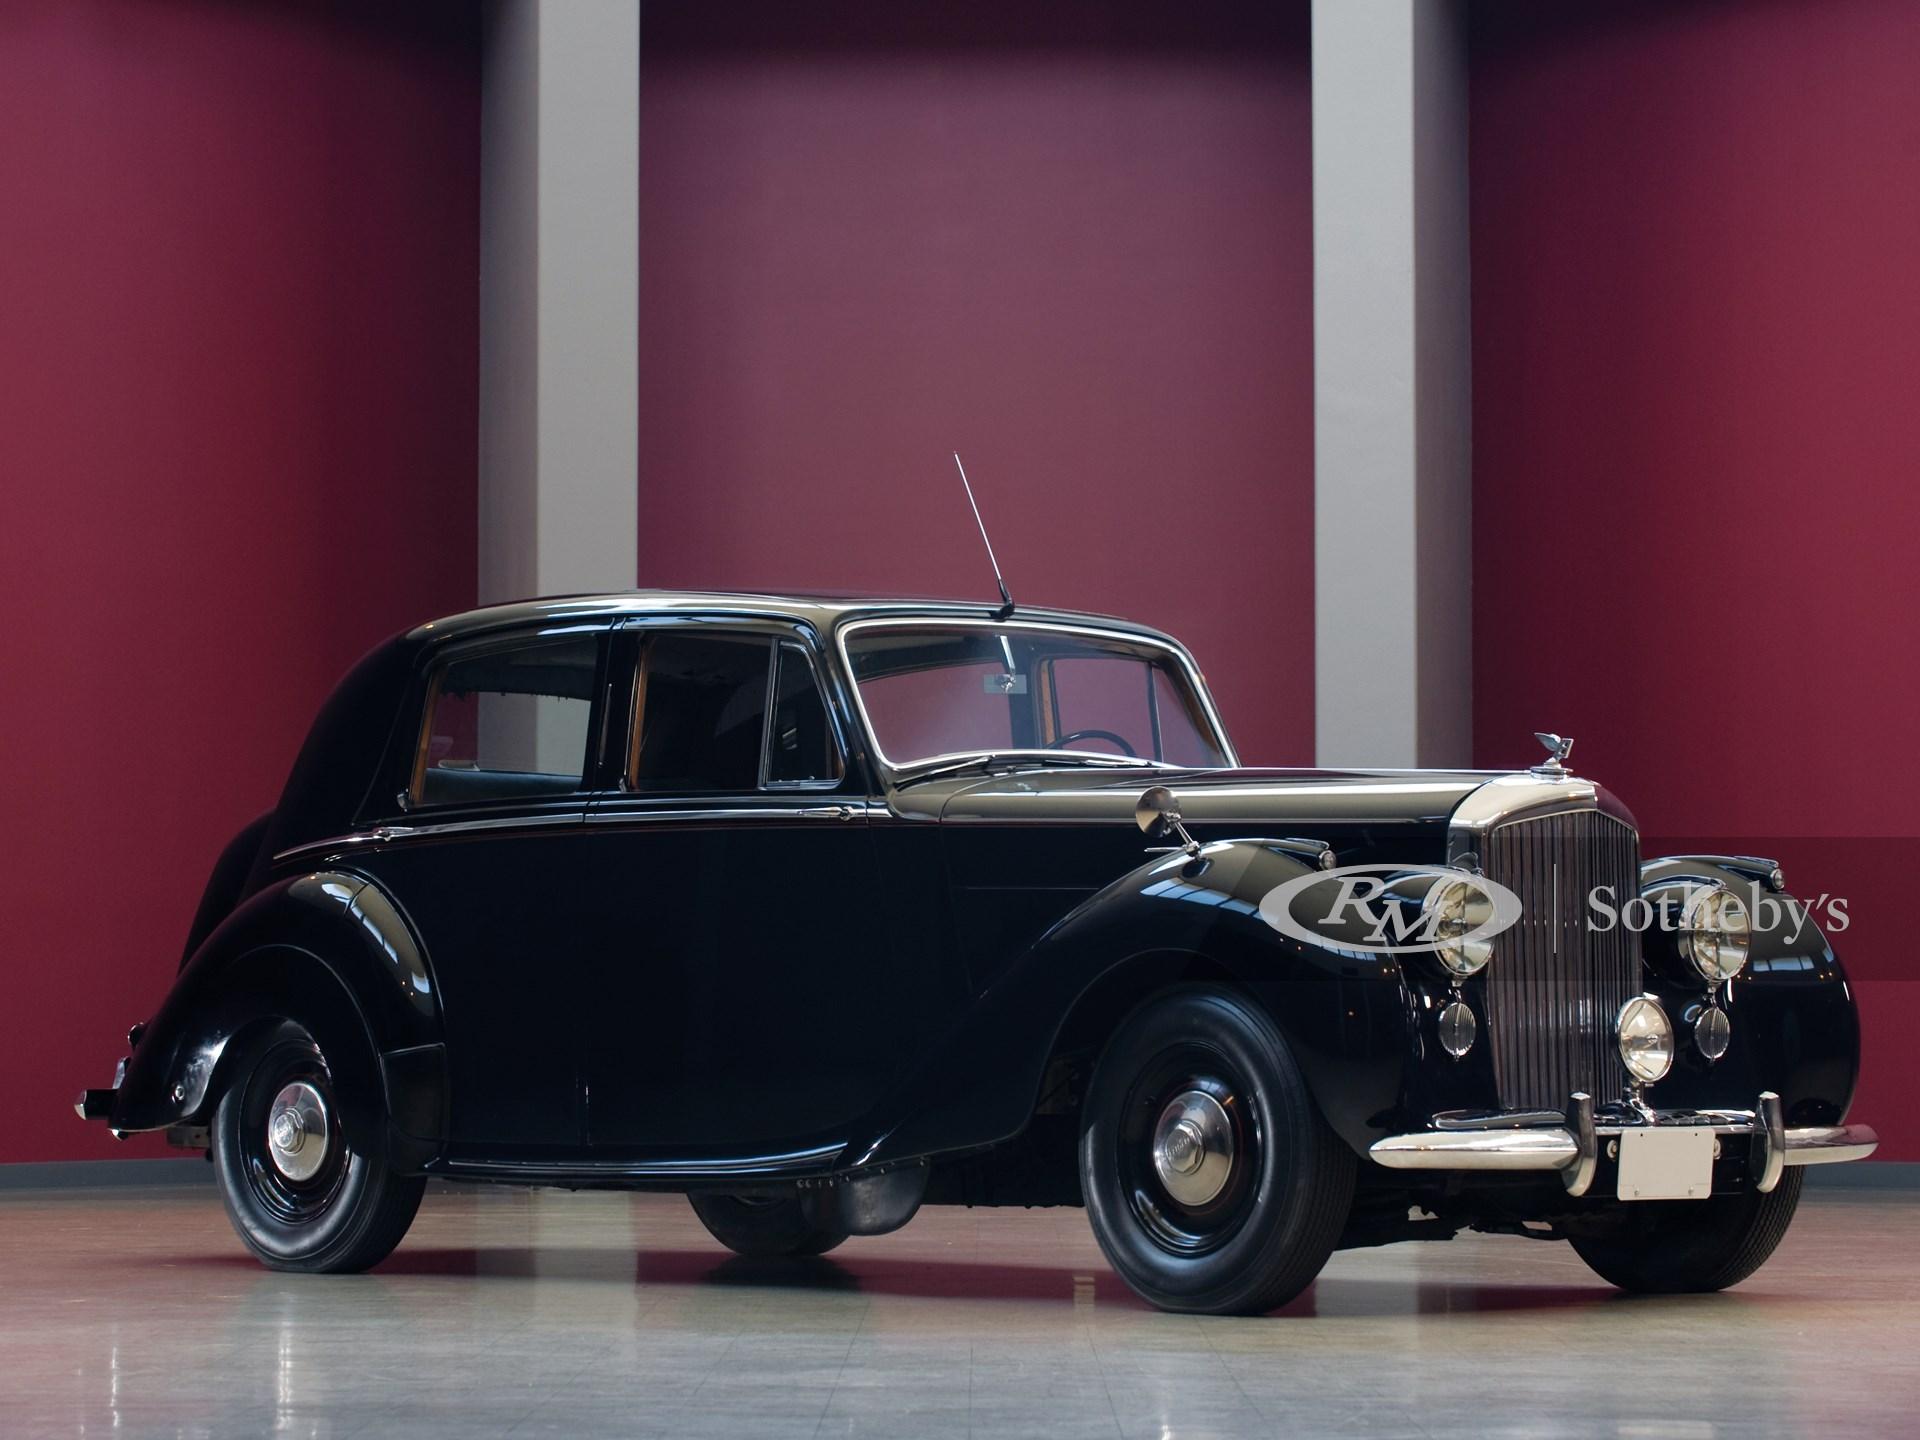 1949 Bentley Mark VI Saloon